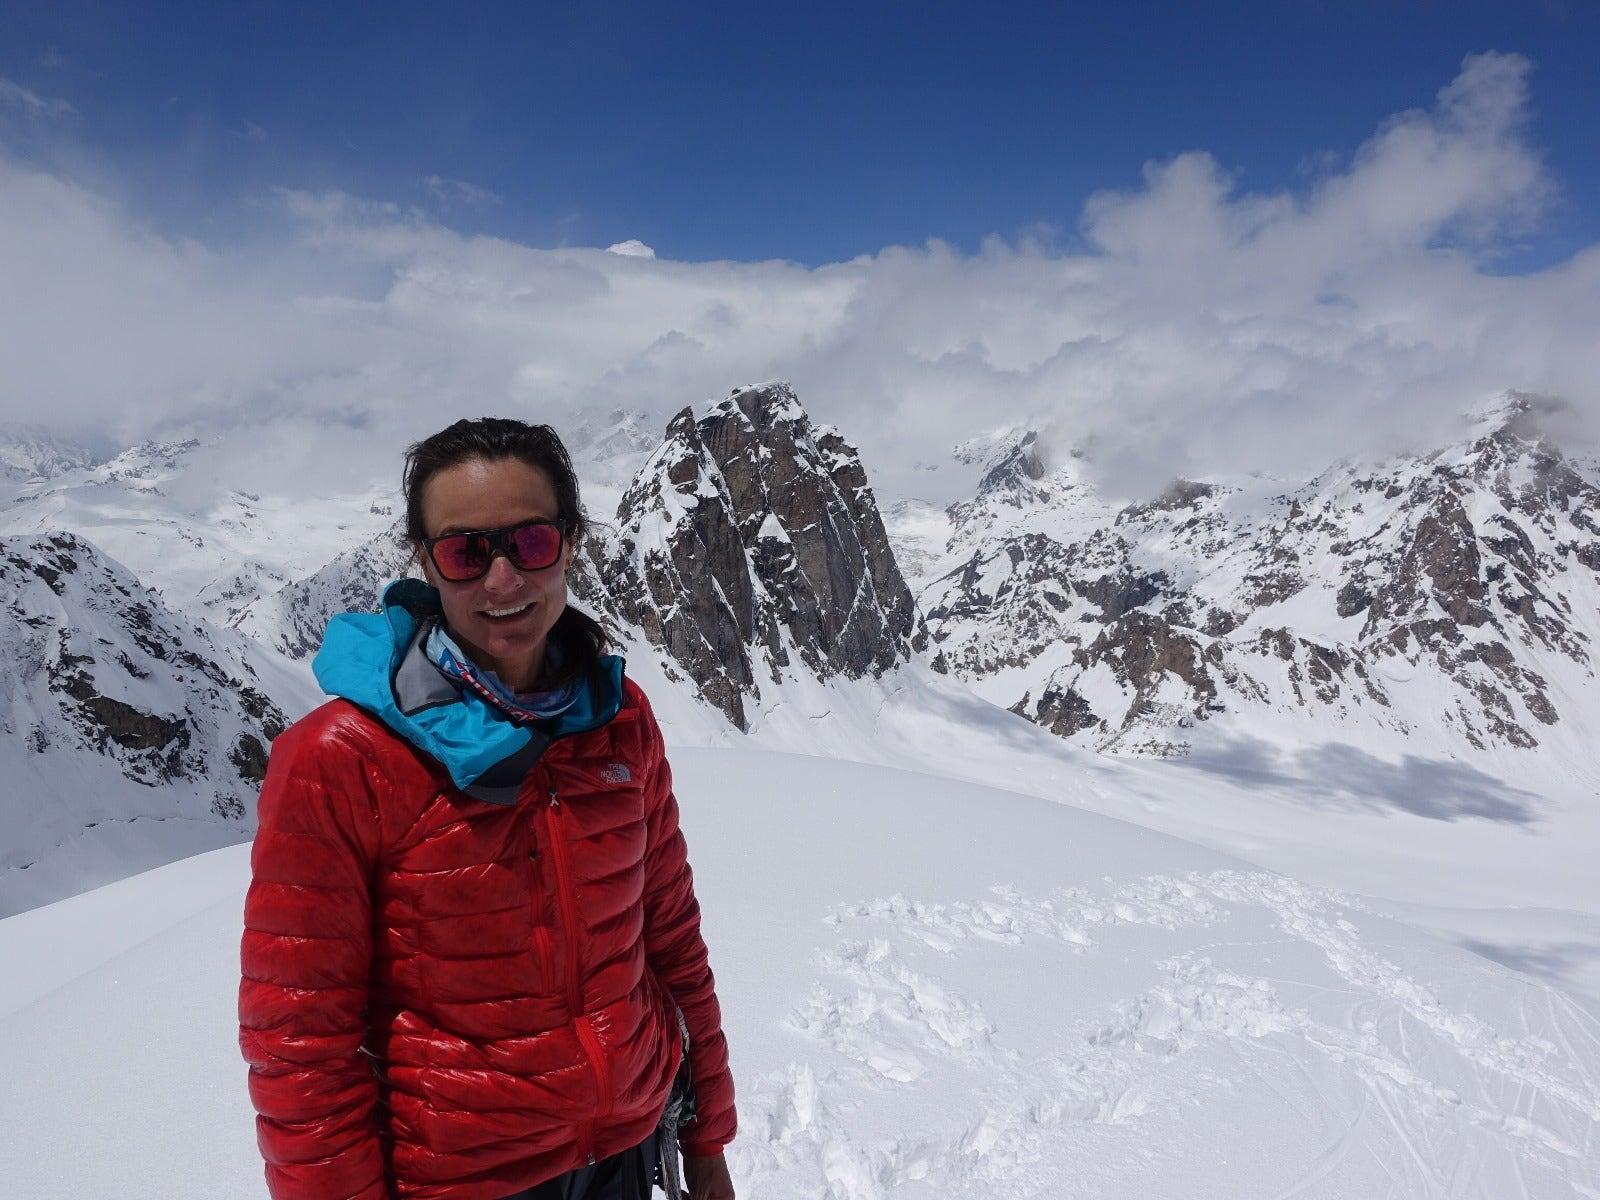 Hilaree Nelson Ski Mountaineer